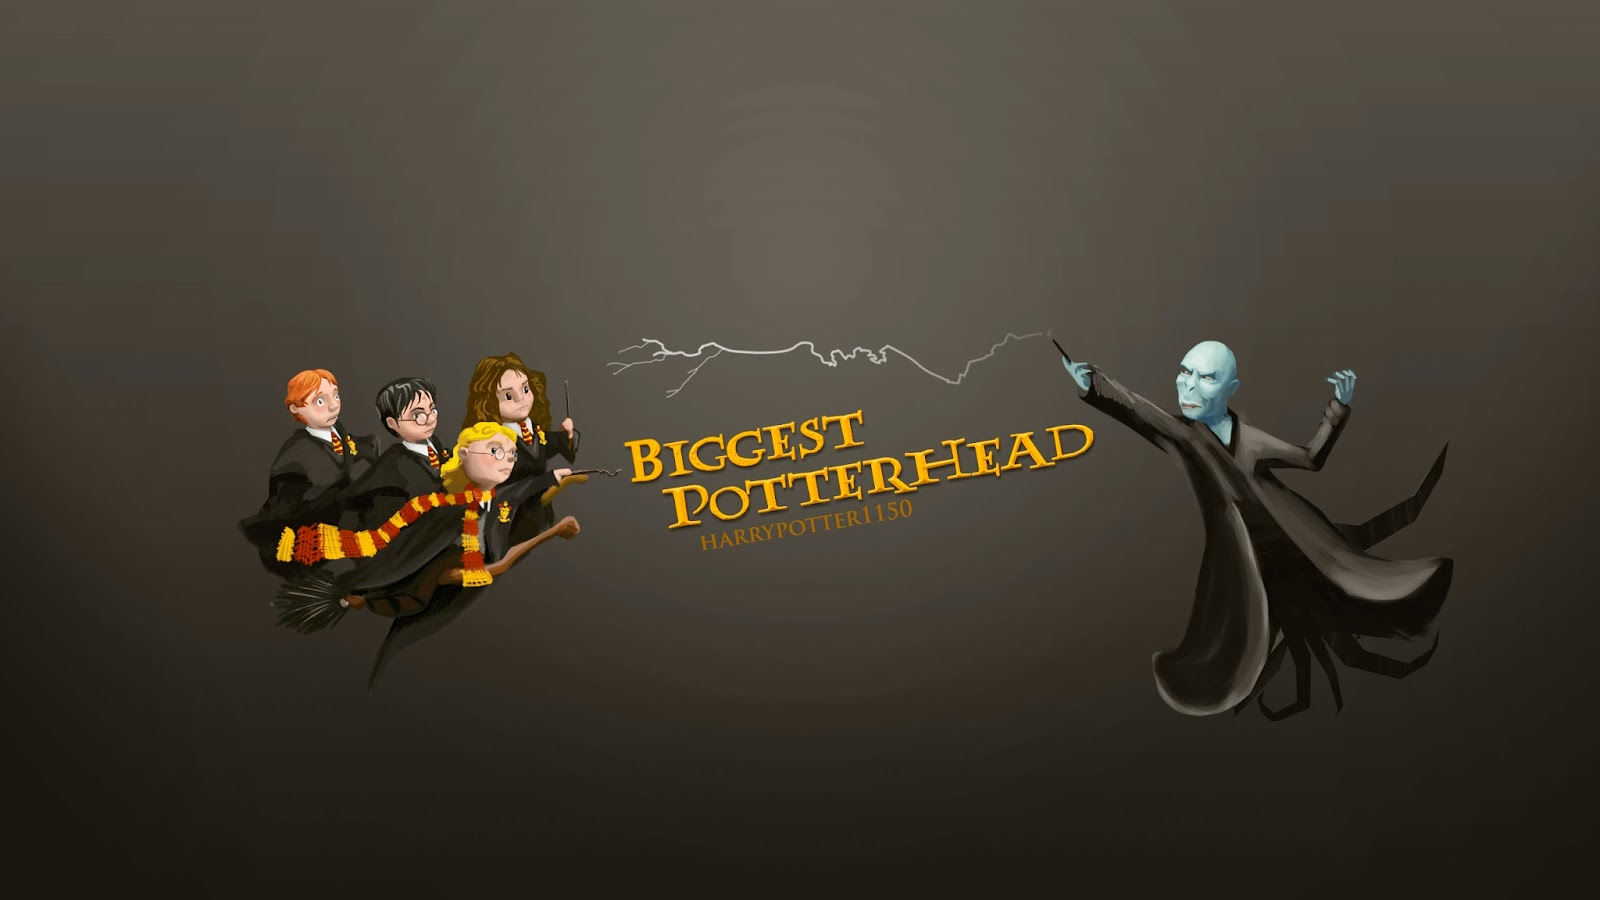 Biggest Potterhead Blog: EVERY SINGLE HARRY POTTER PAIRING